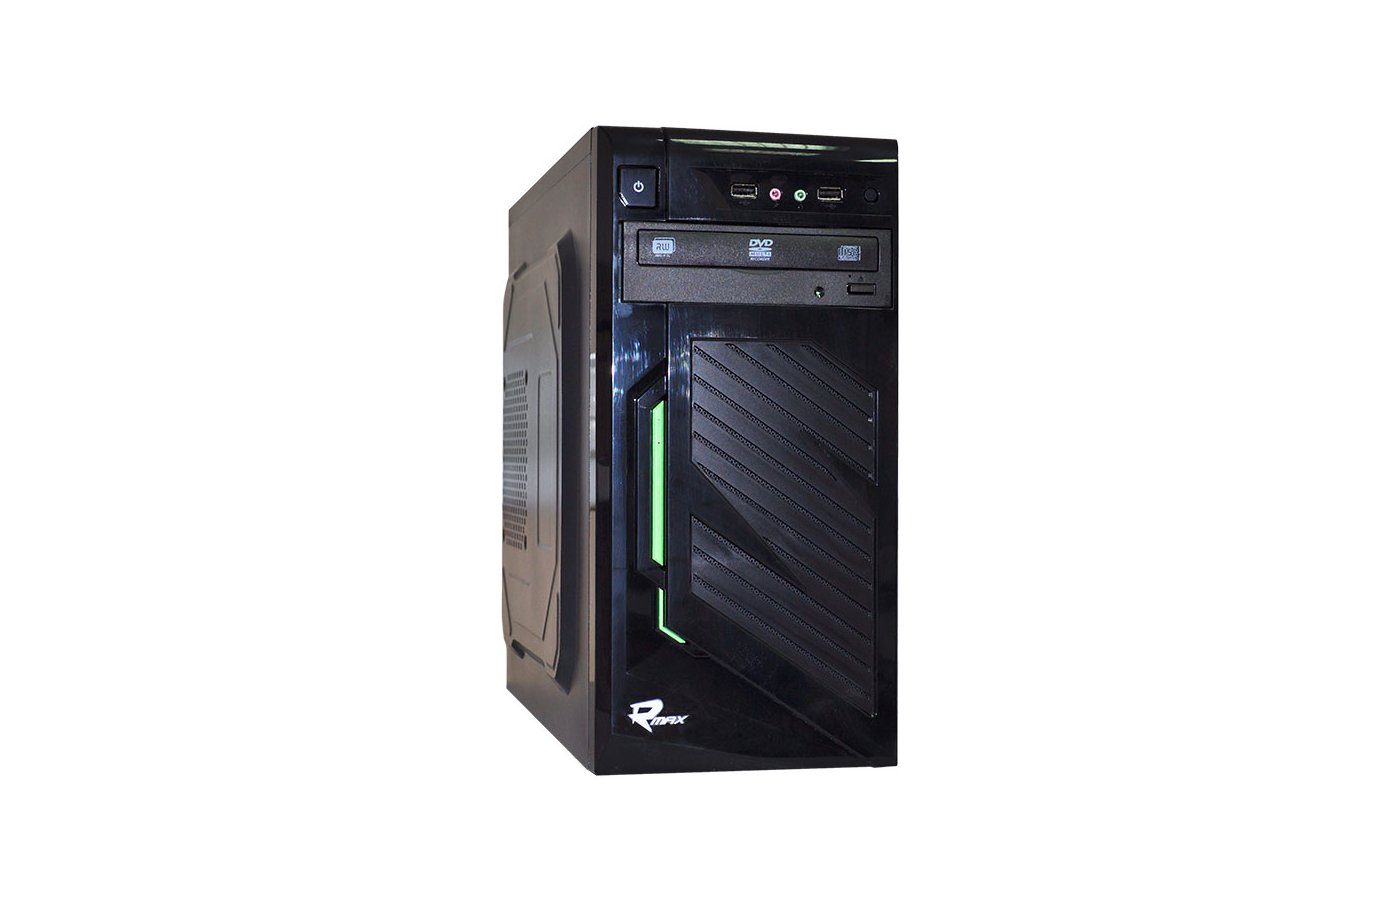 Системный блок Rmax 309 Office Pro intel i3 370M 2.4Gh/8Gb/500Gb/DVDRW/Win7